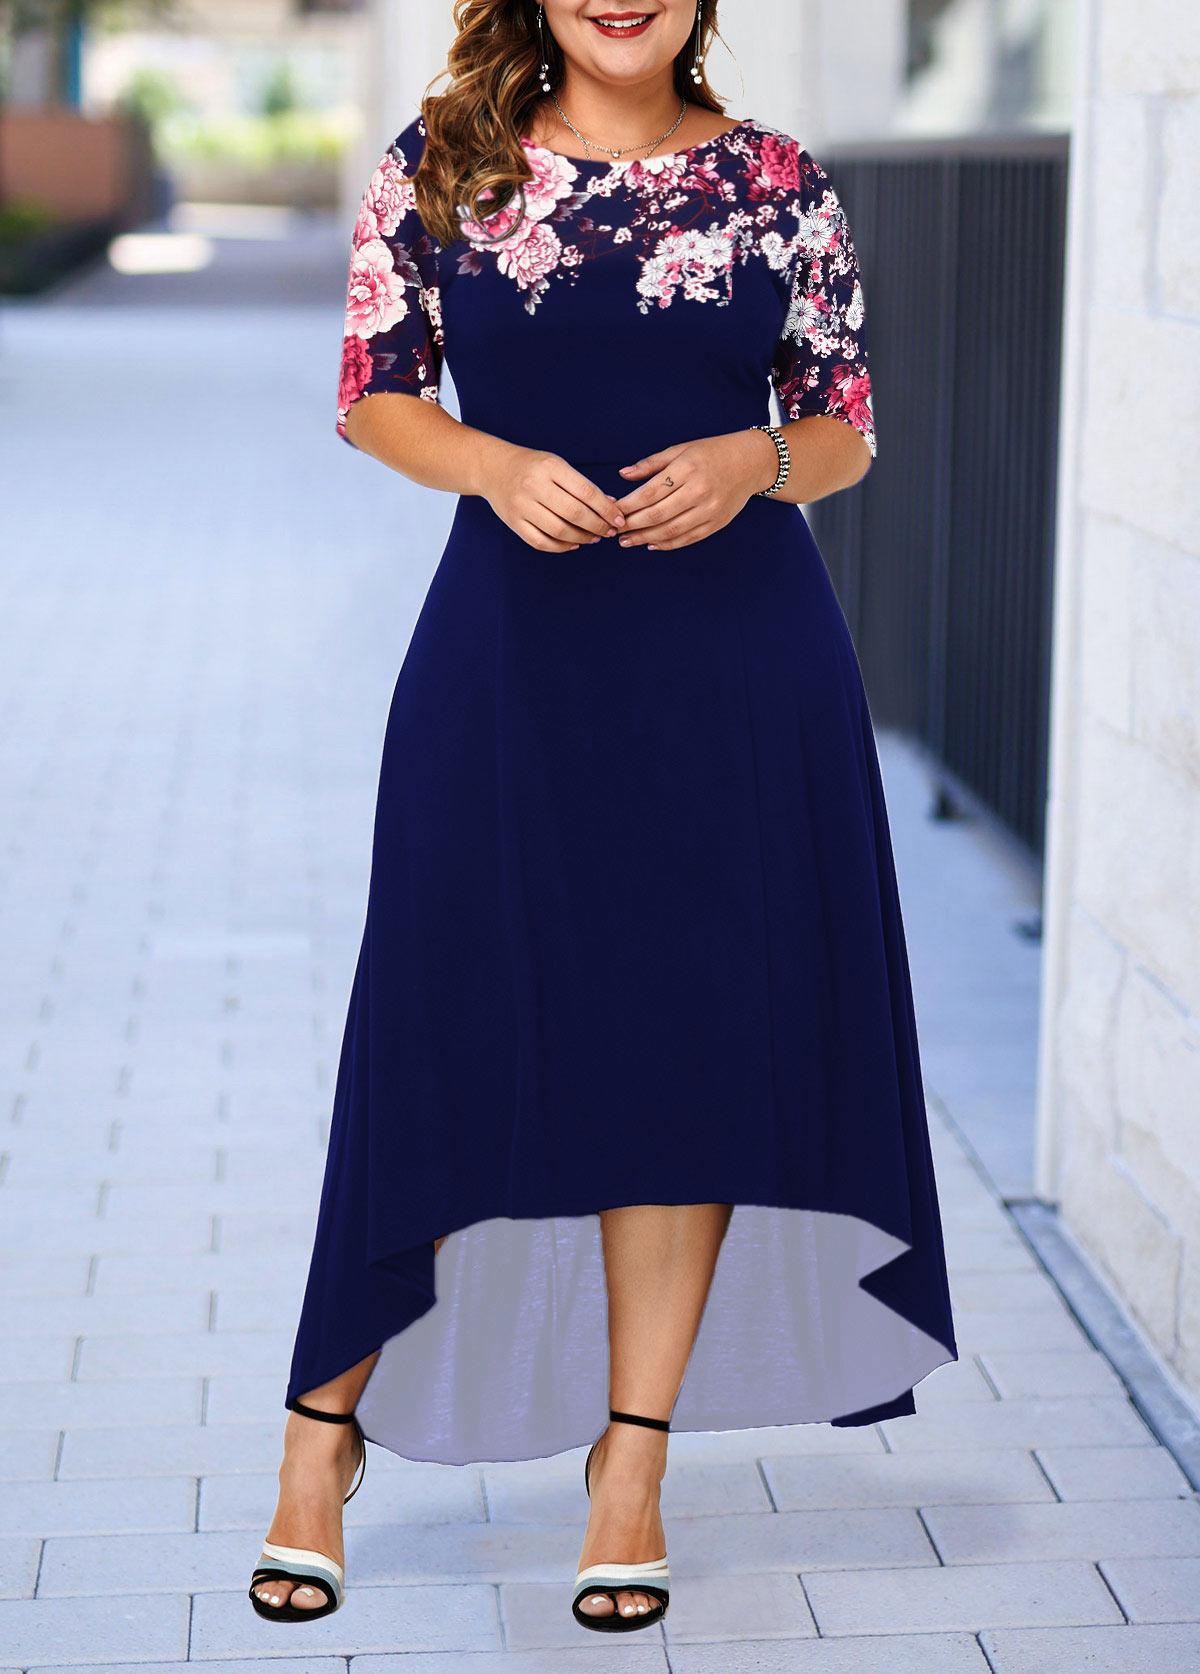 Dip Hem Flower Print Plus Size Dress